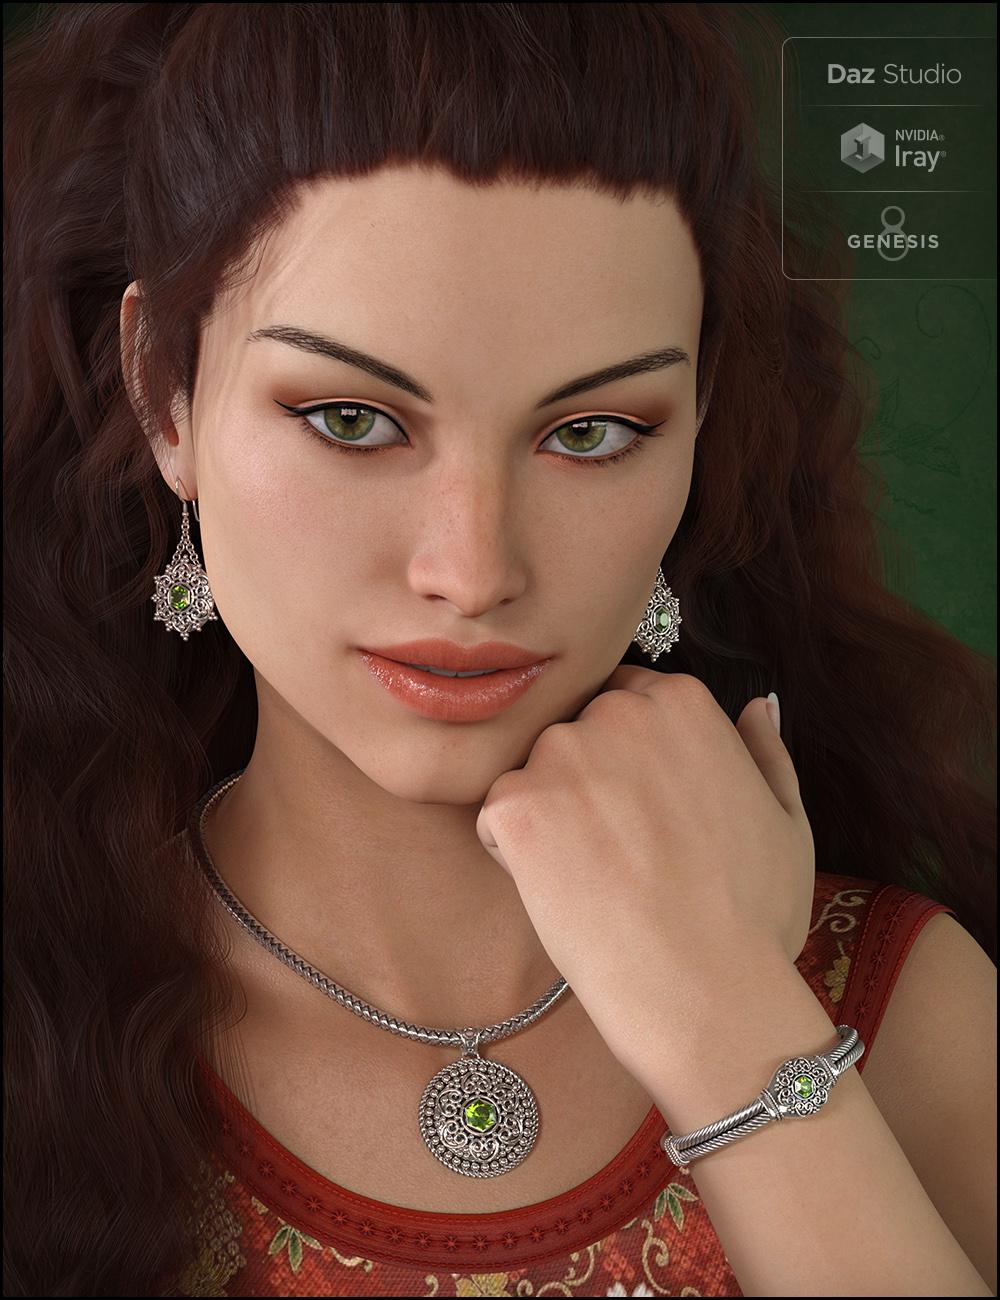 Bali Jewelry for Genesis 8 Female(s) by: Fisty & Darc, 3D Models by Daz 3D